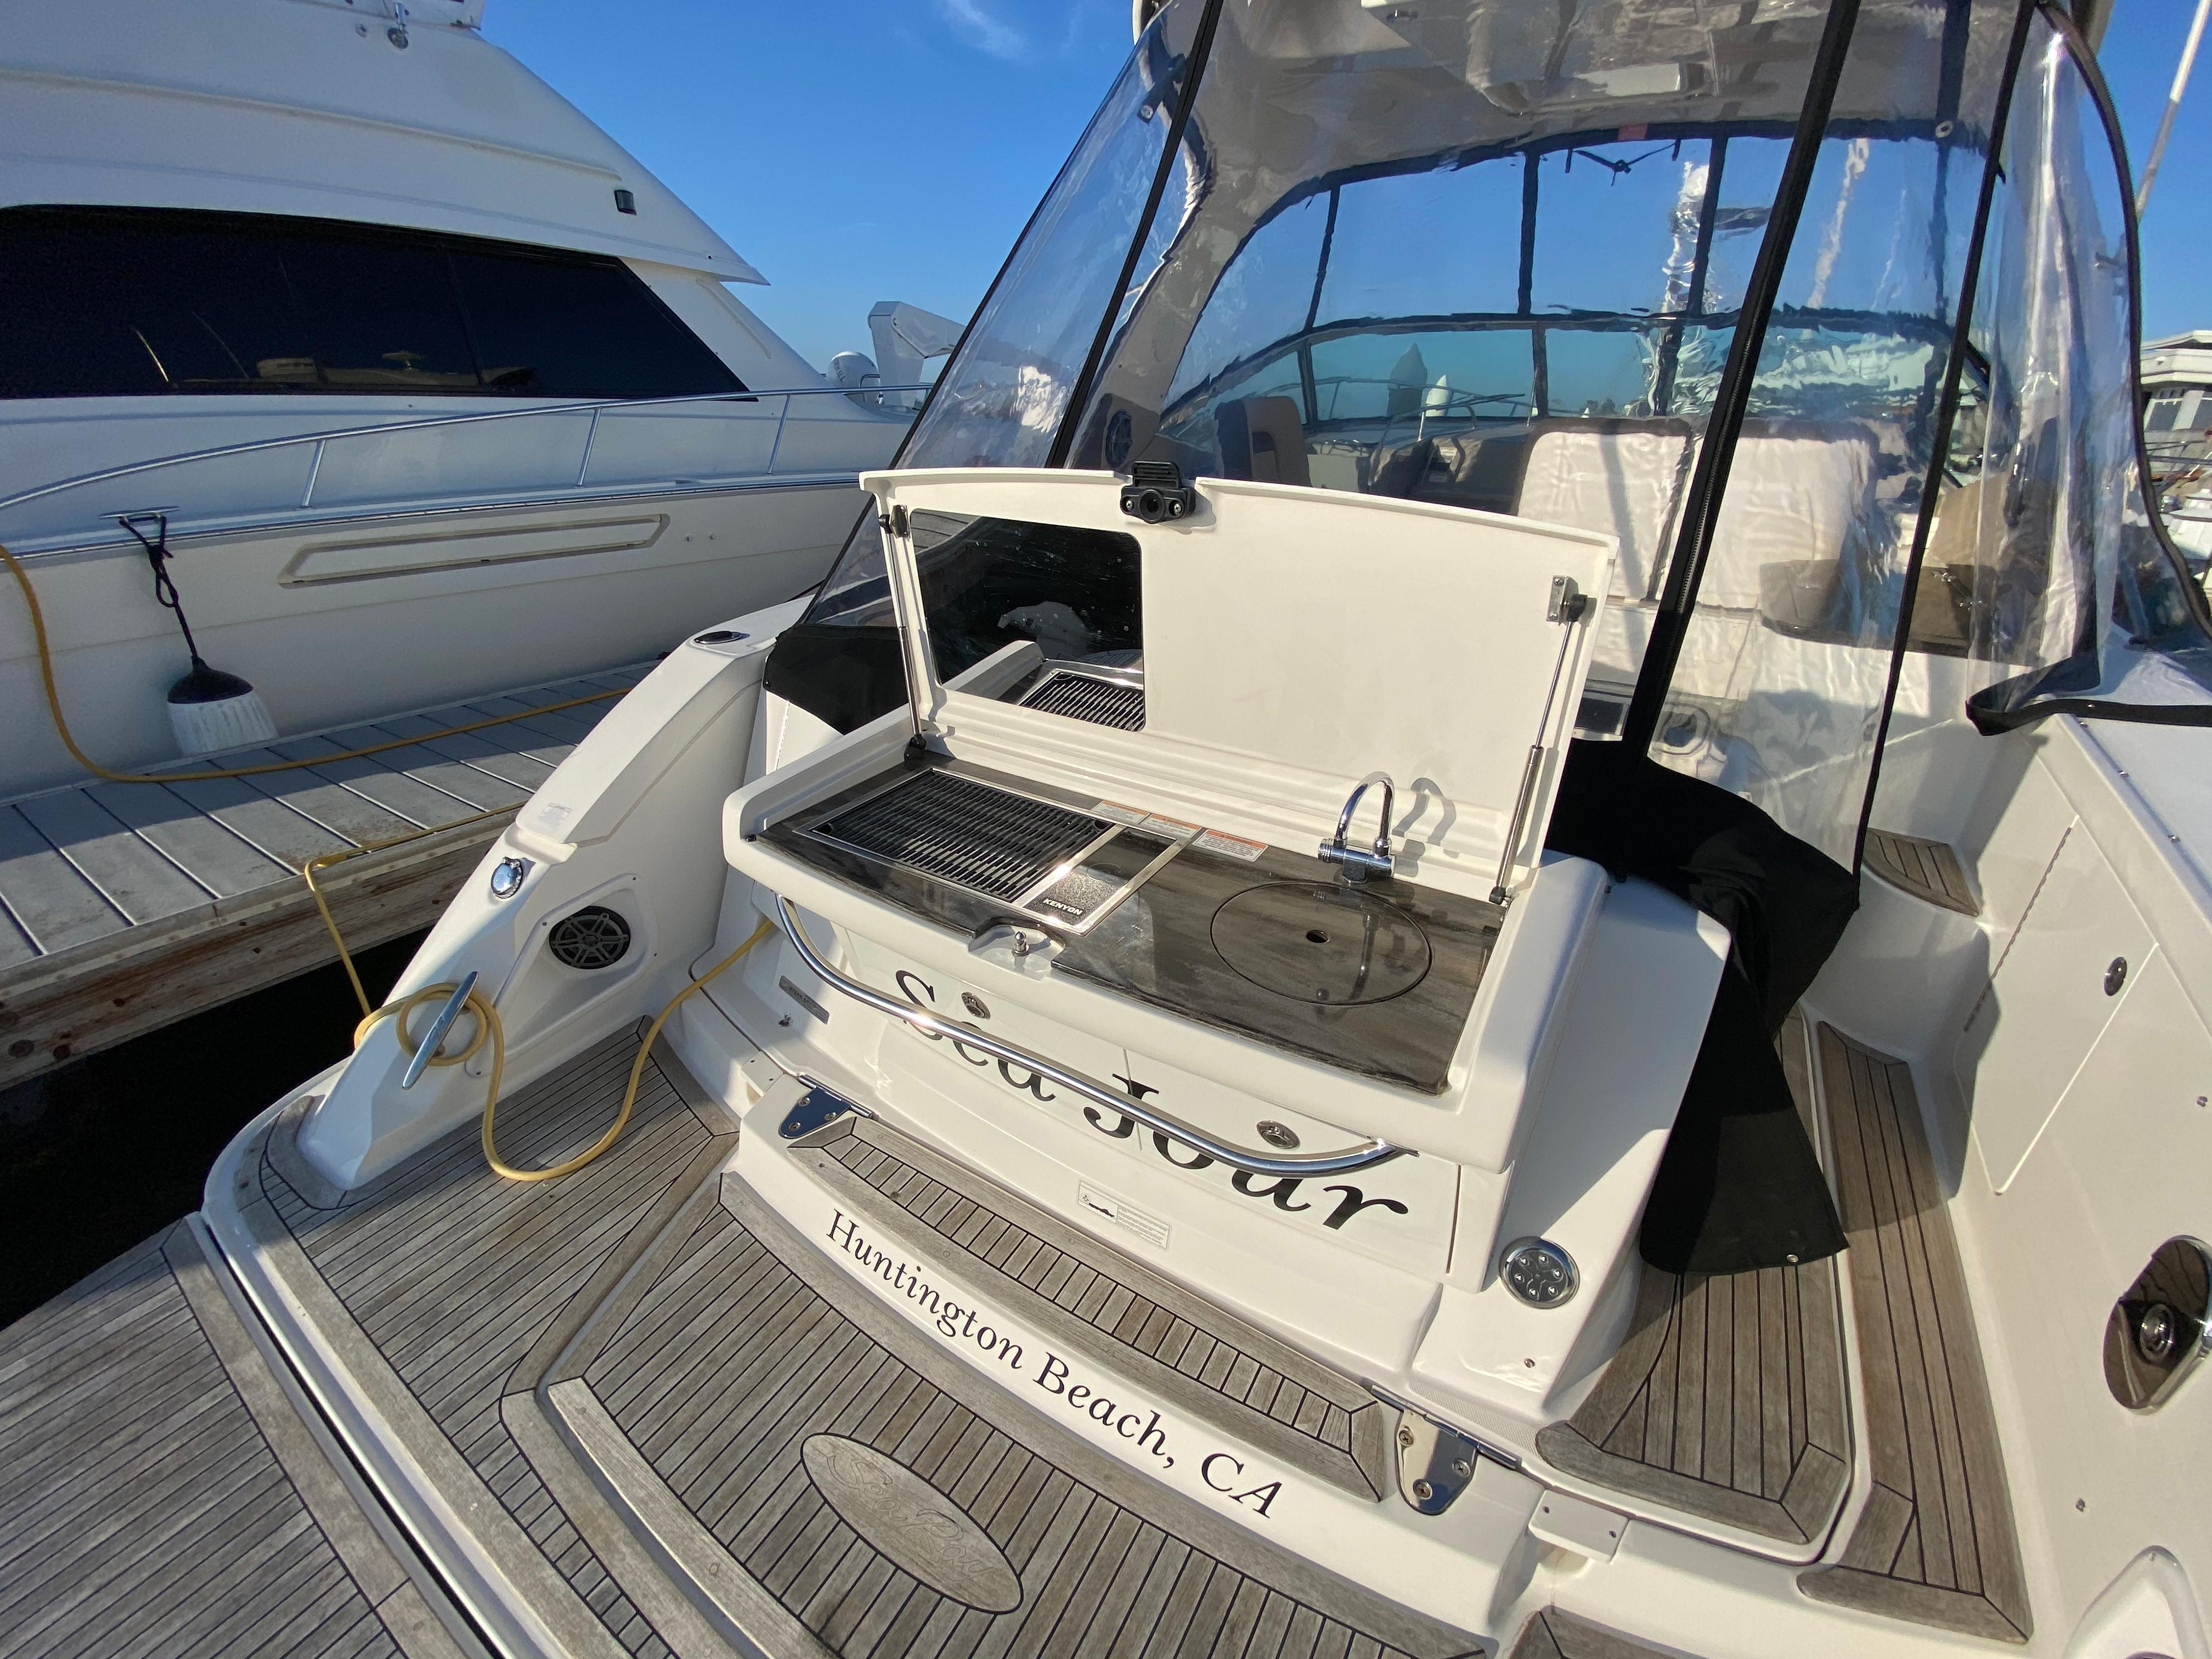 2014 Sea Ray 370 Sundancer #TB8265JP inventory image at Sun Country Coastal in Newport Beach